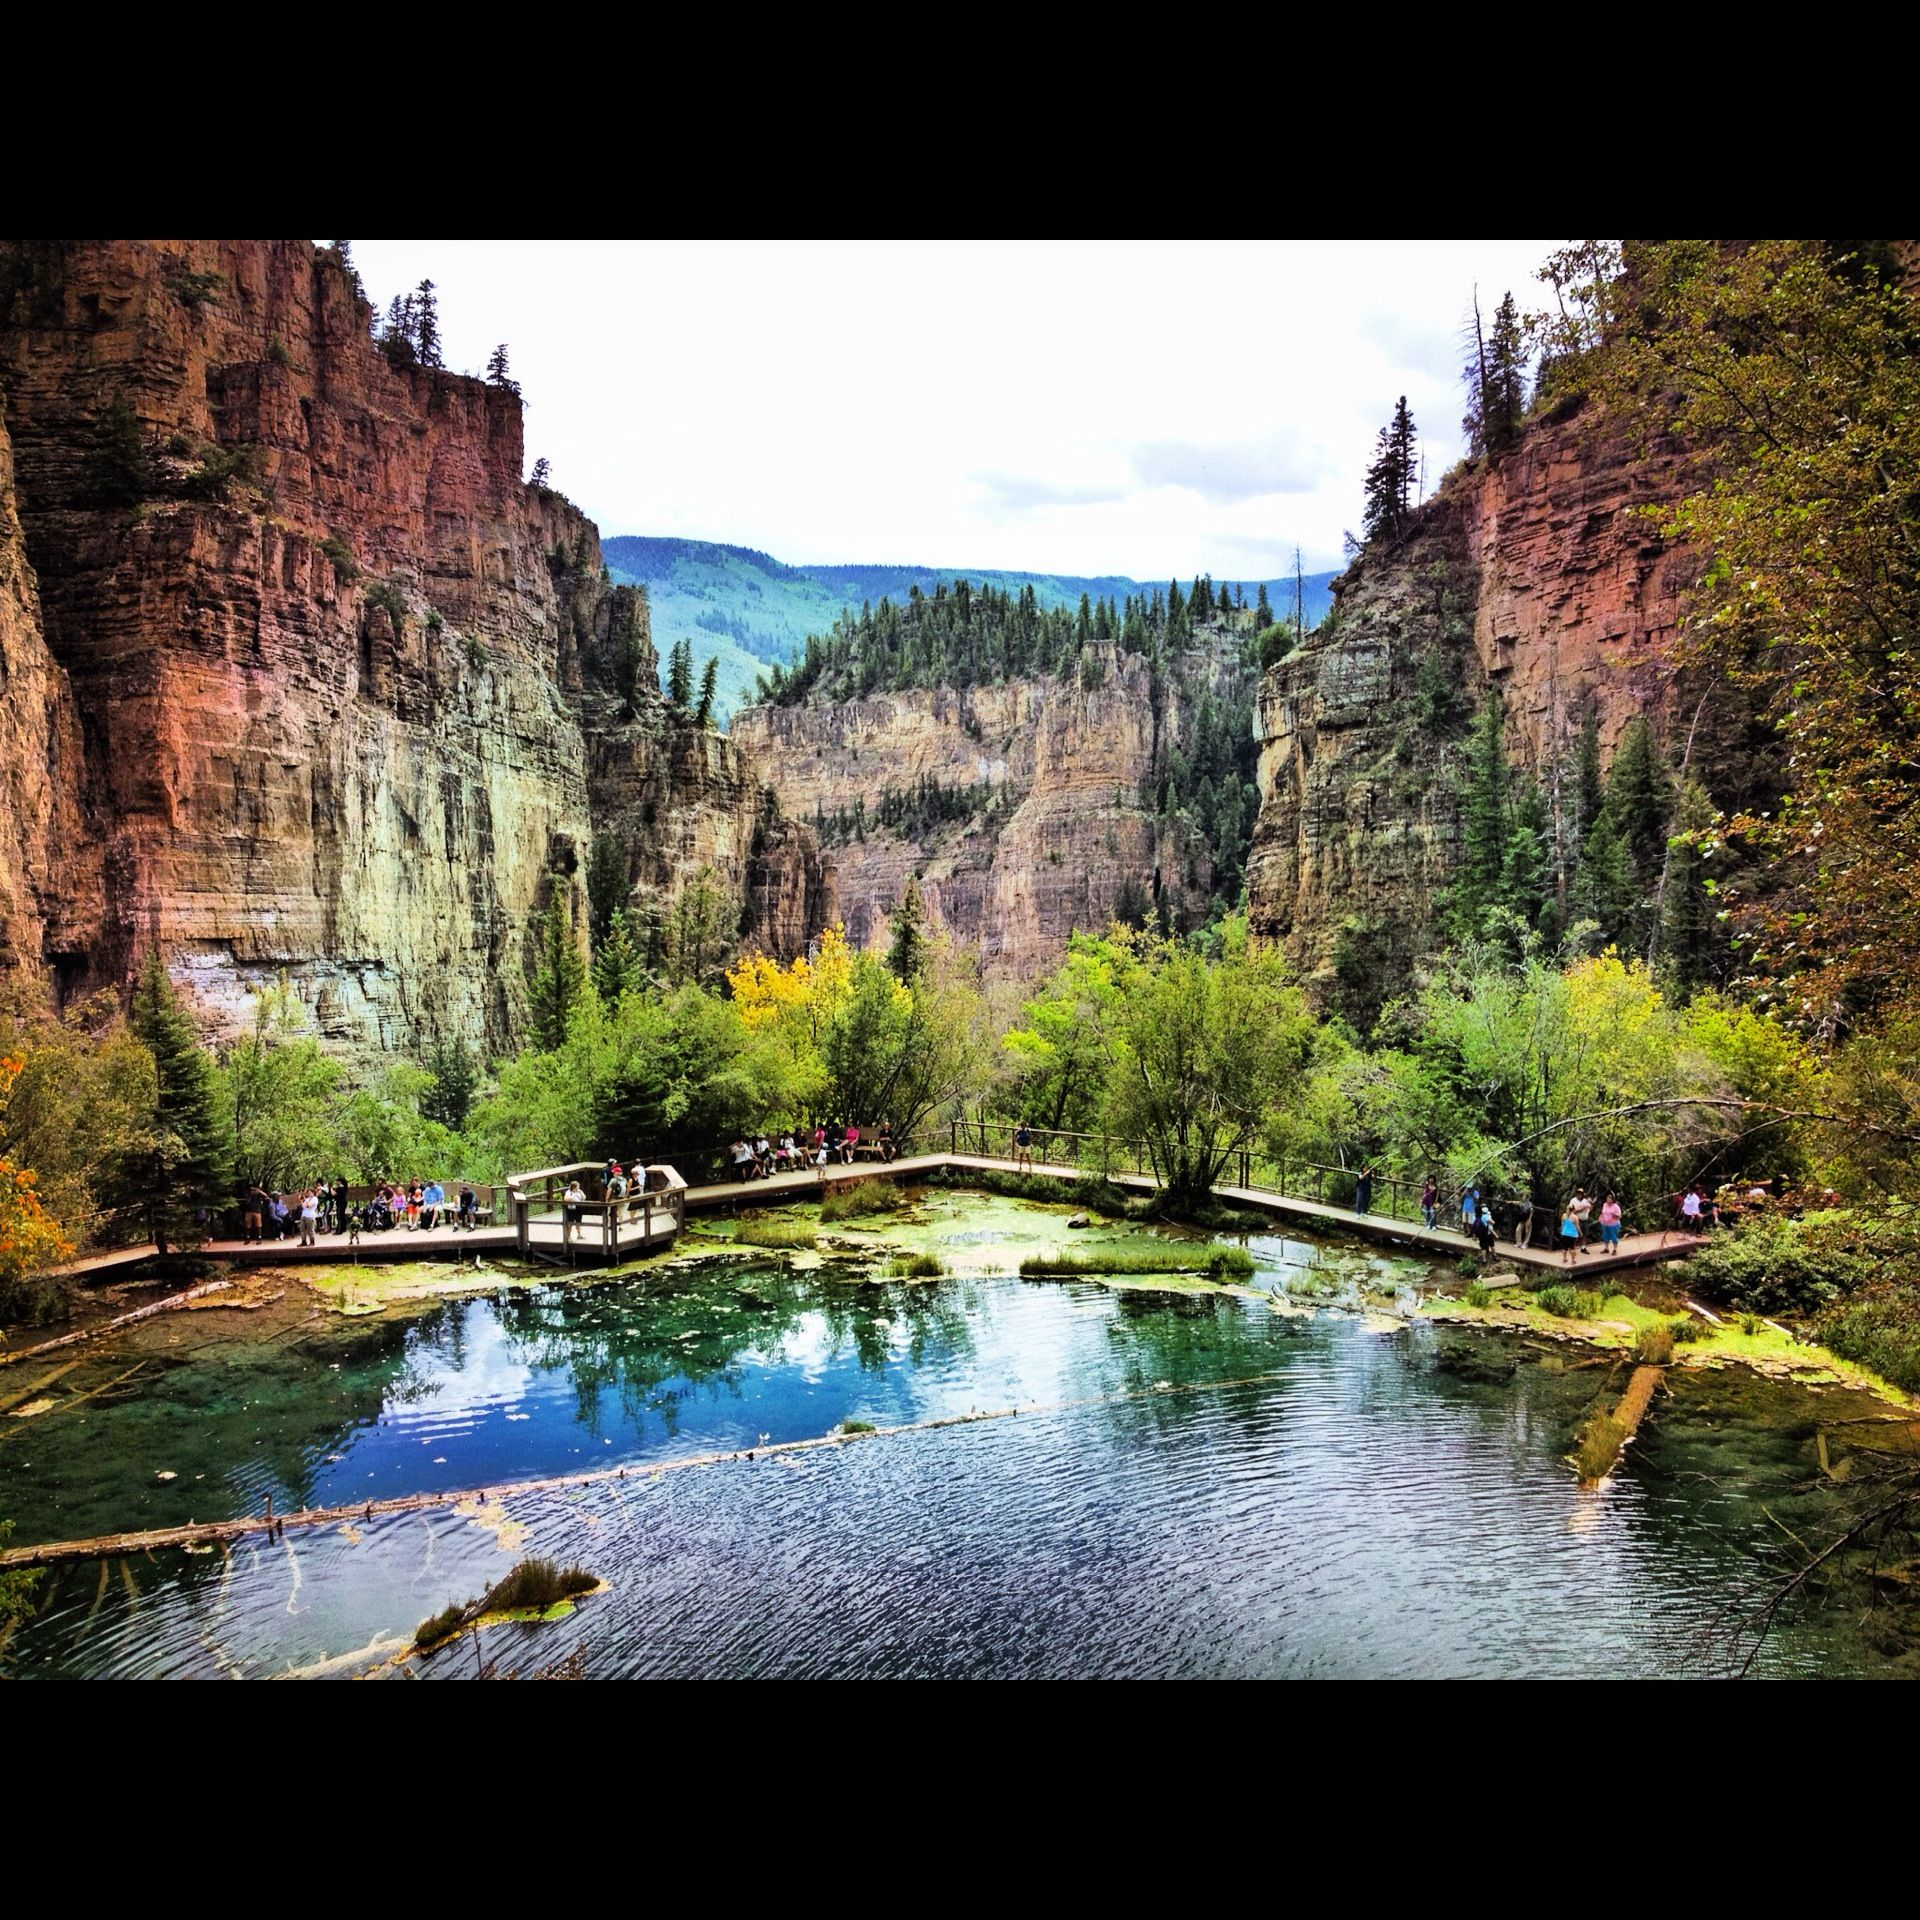 Rocky Glen Park Home: My Utmost Favorite Place In Colorado!!!!!!!!💜💜💜💜💜 Colorado